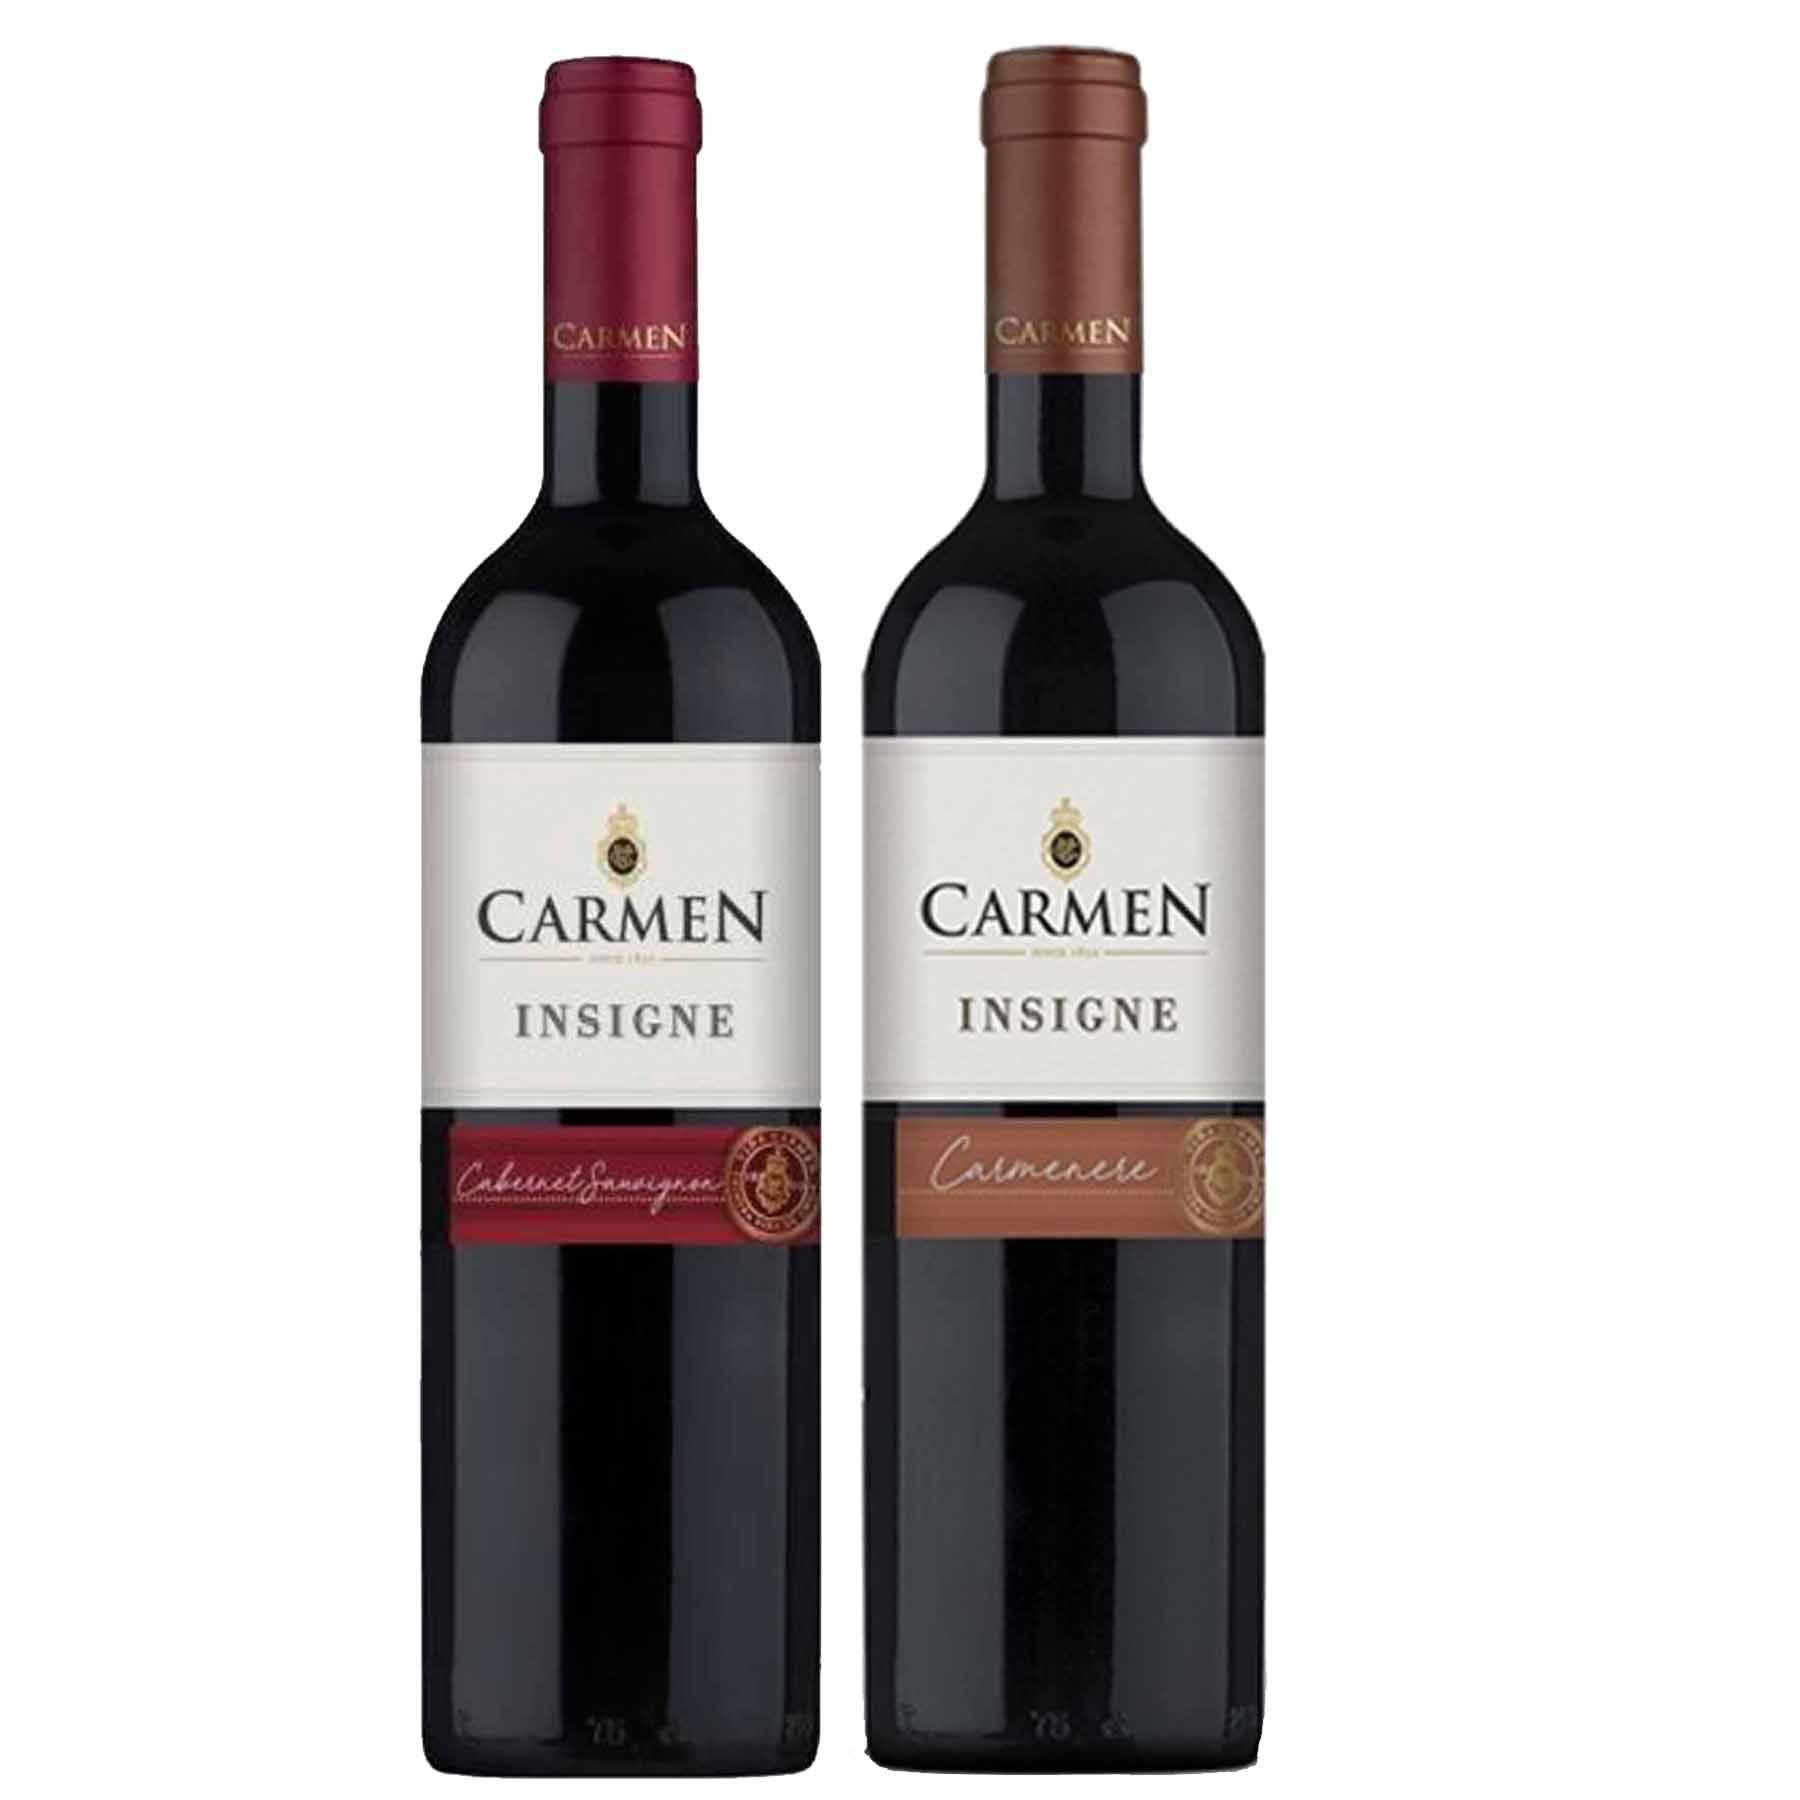 Kit 2 Vinhos Chilenos Carmen Insigne Cabernet Sauvignon e Carmenere